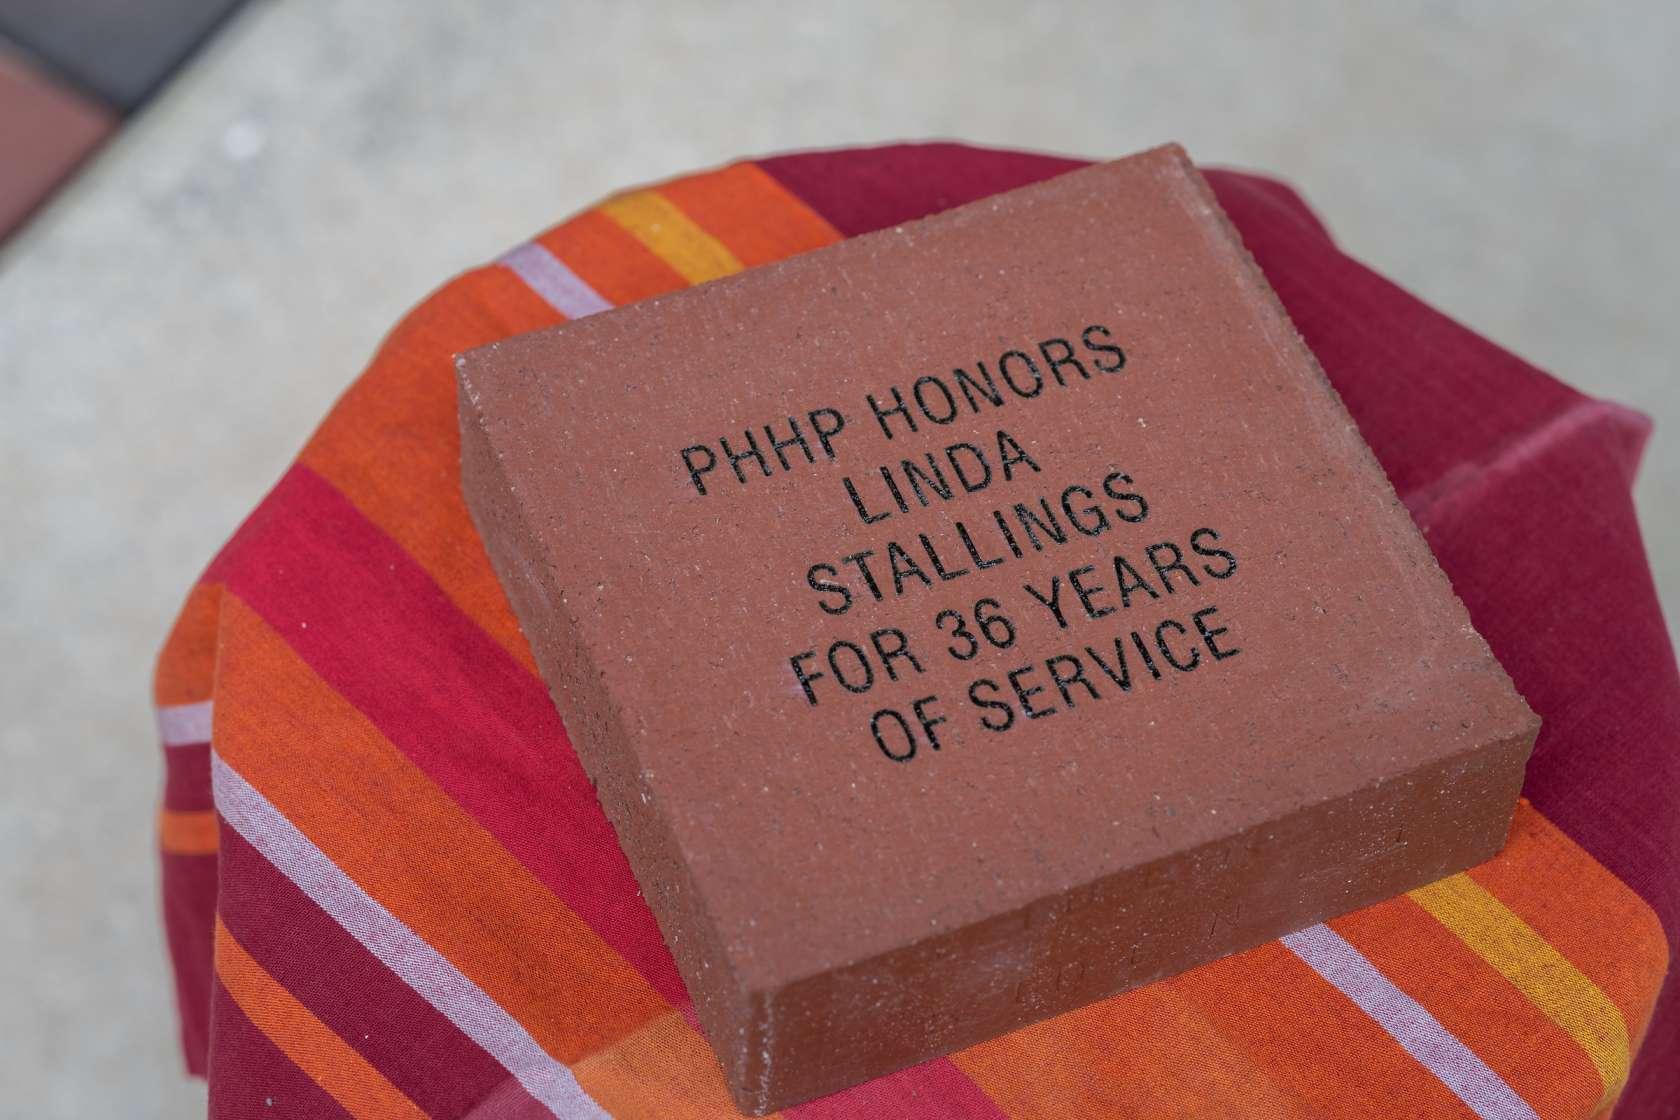 brick engraved with message honoring Linda Stallings